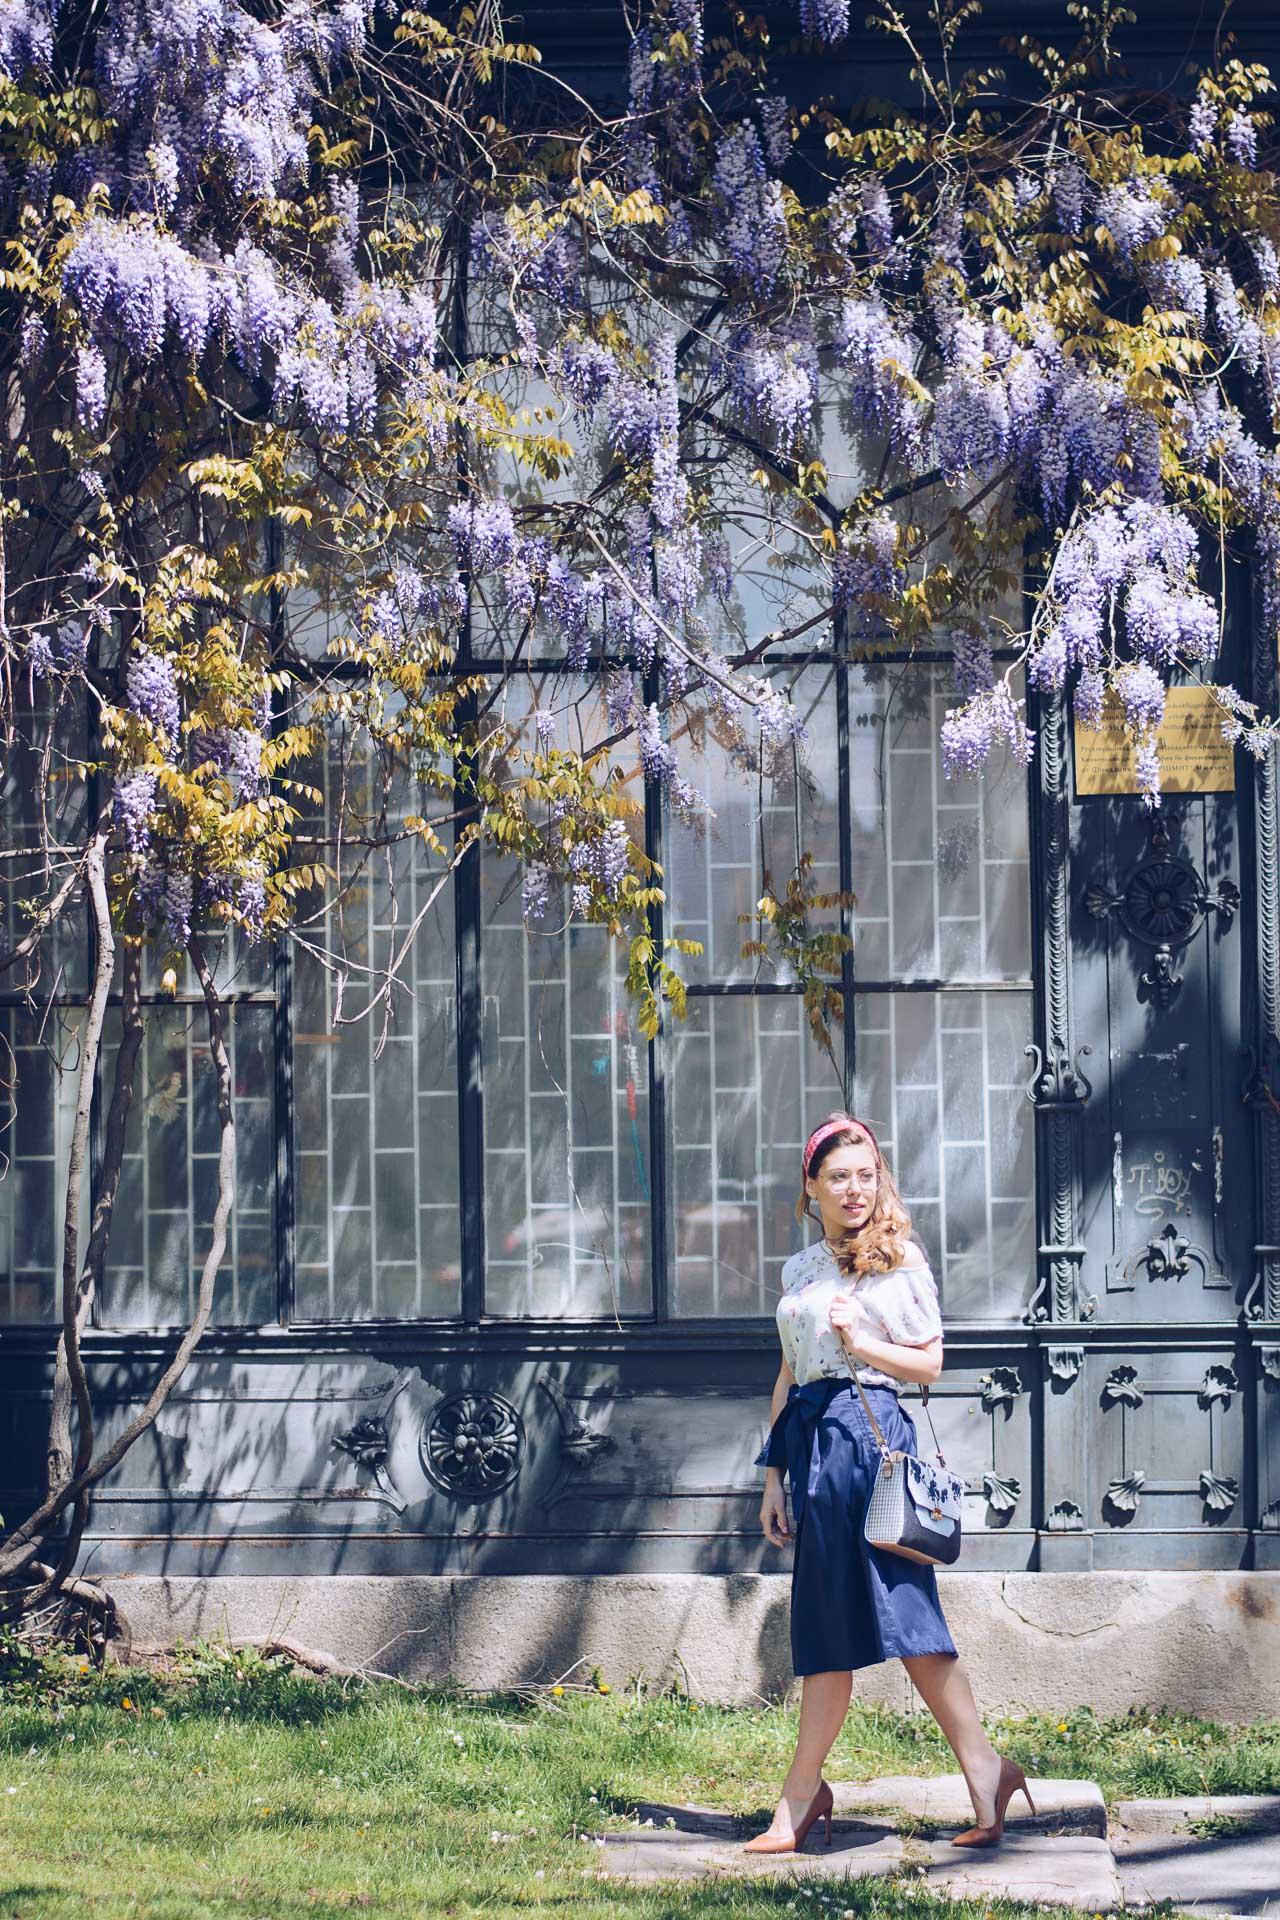 ESPRIT Skirt Pronta bag Spring Outfit